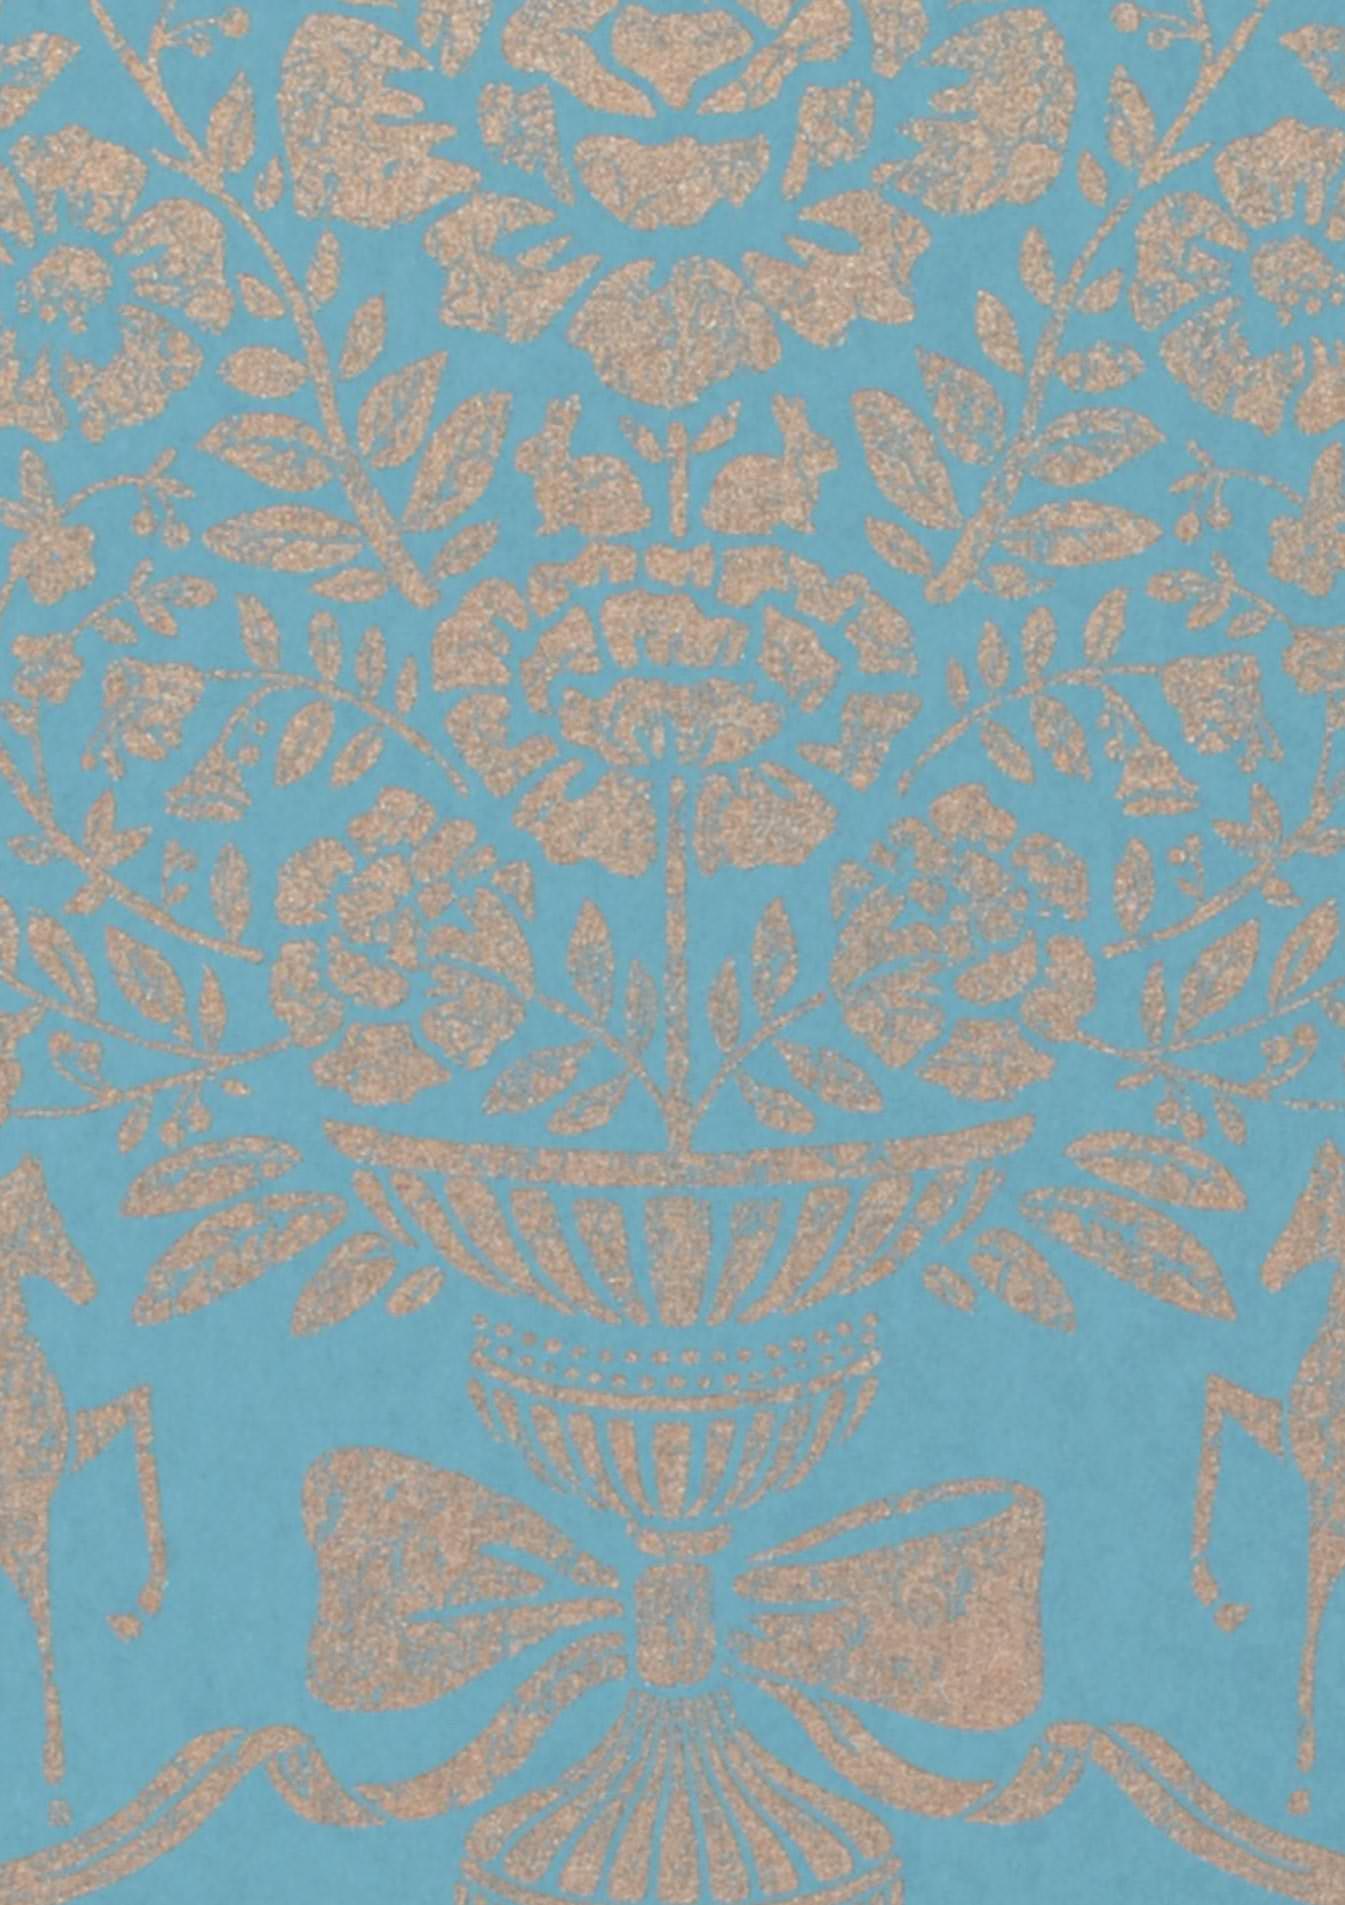 Tapete sisan hellblau braunbeige tapeten der 70er for Tapete hellblau muster